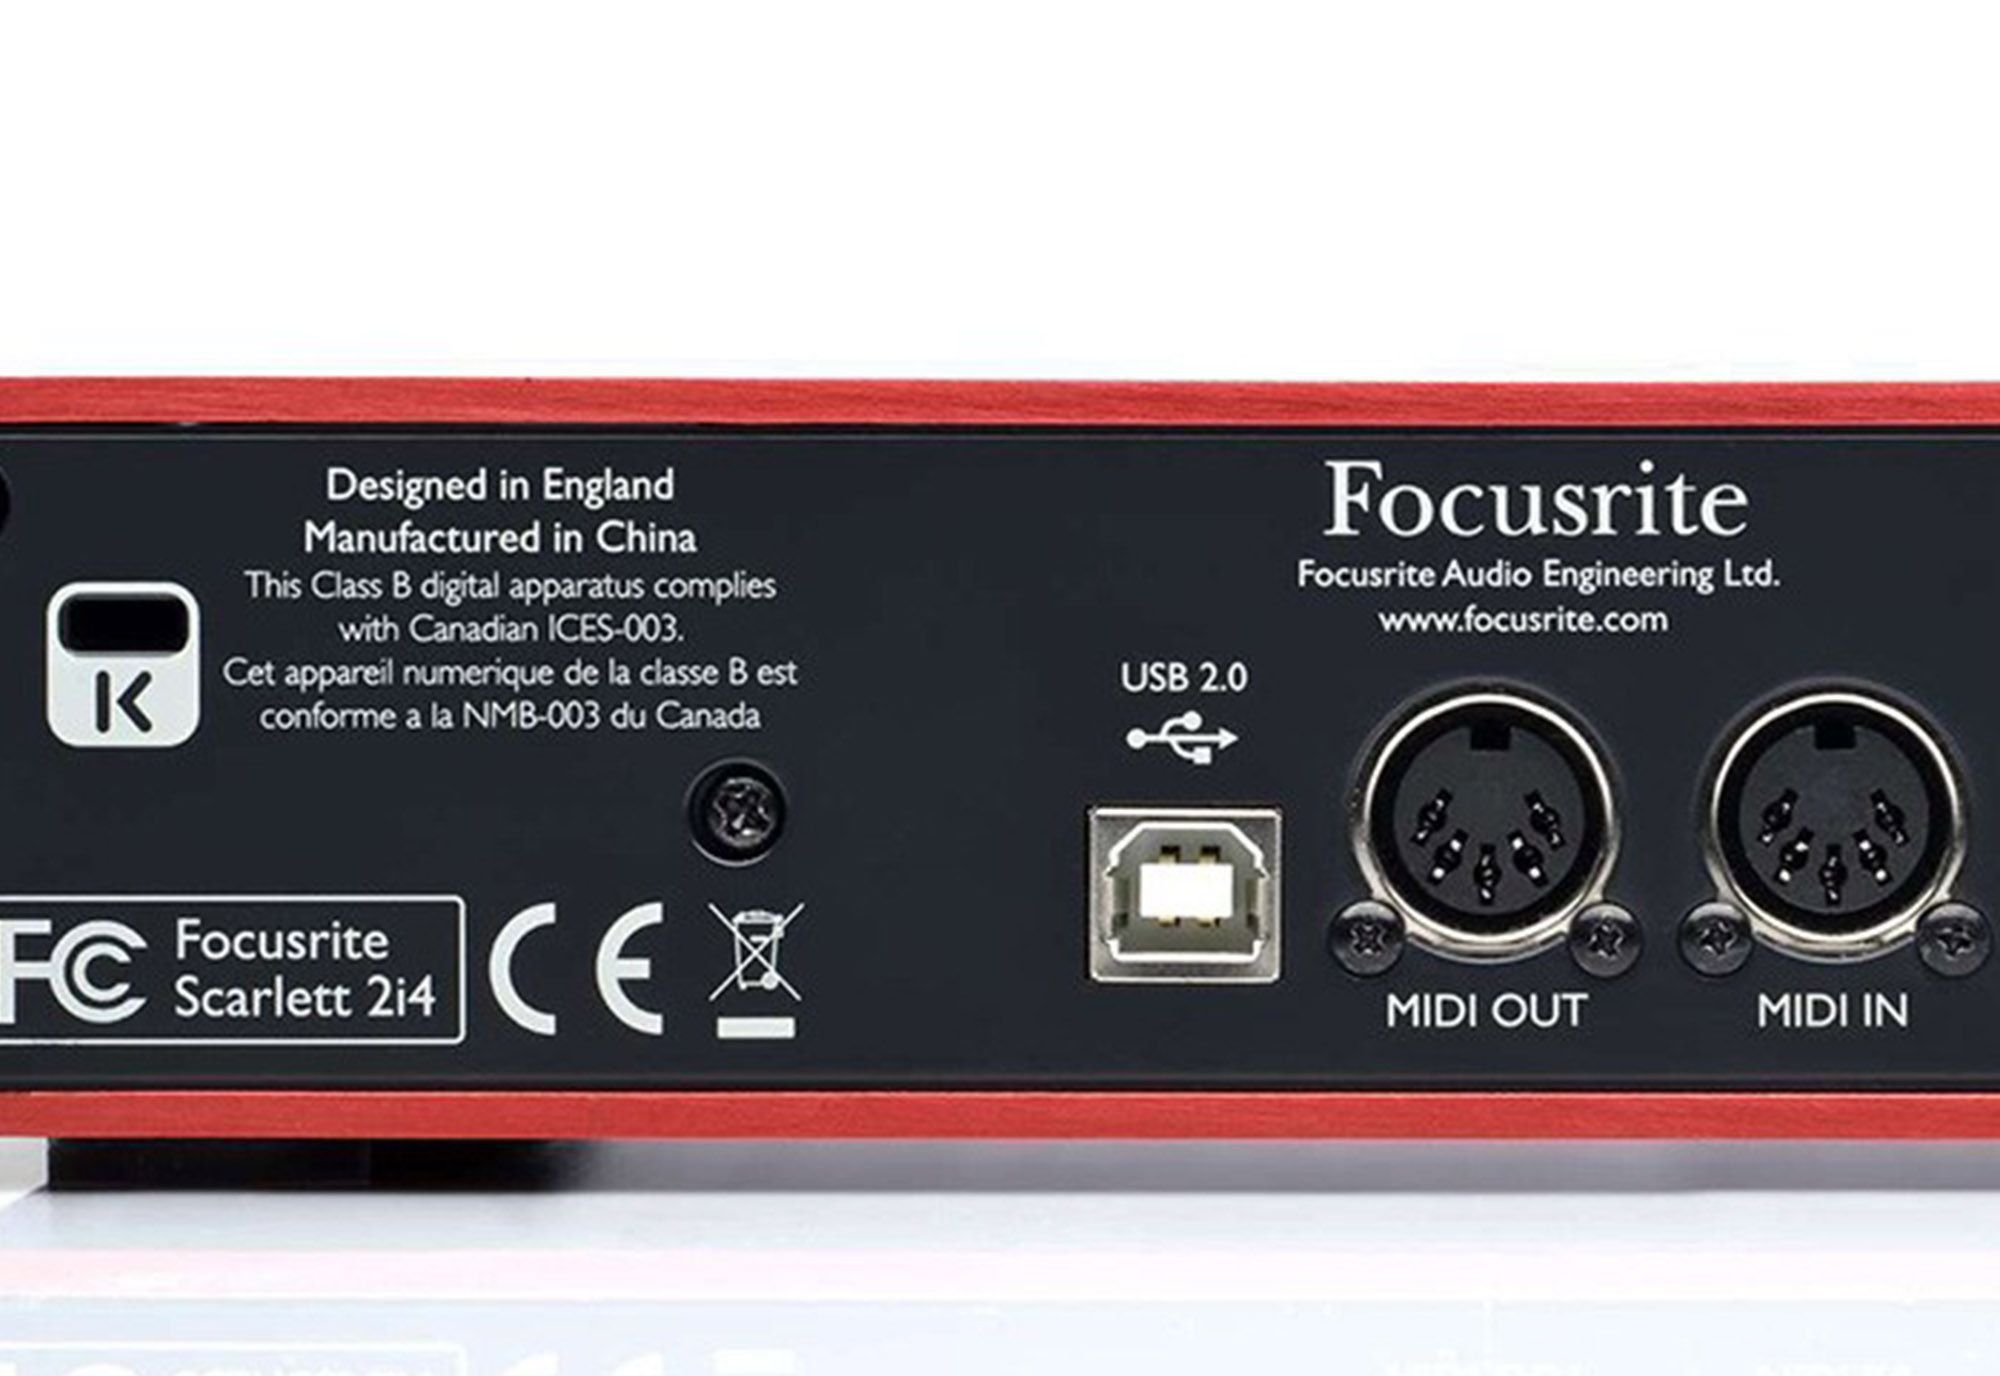 Focusrite Scarlett 2i4 2ª Geração Interface de Áudio Scarlett 2 i 4 Usb 2x4 Usb